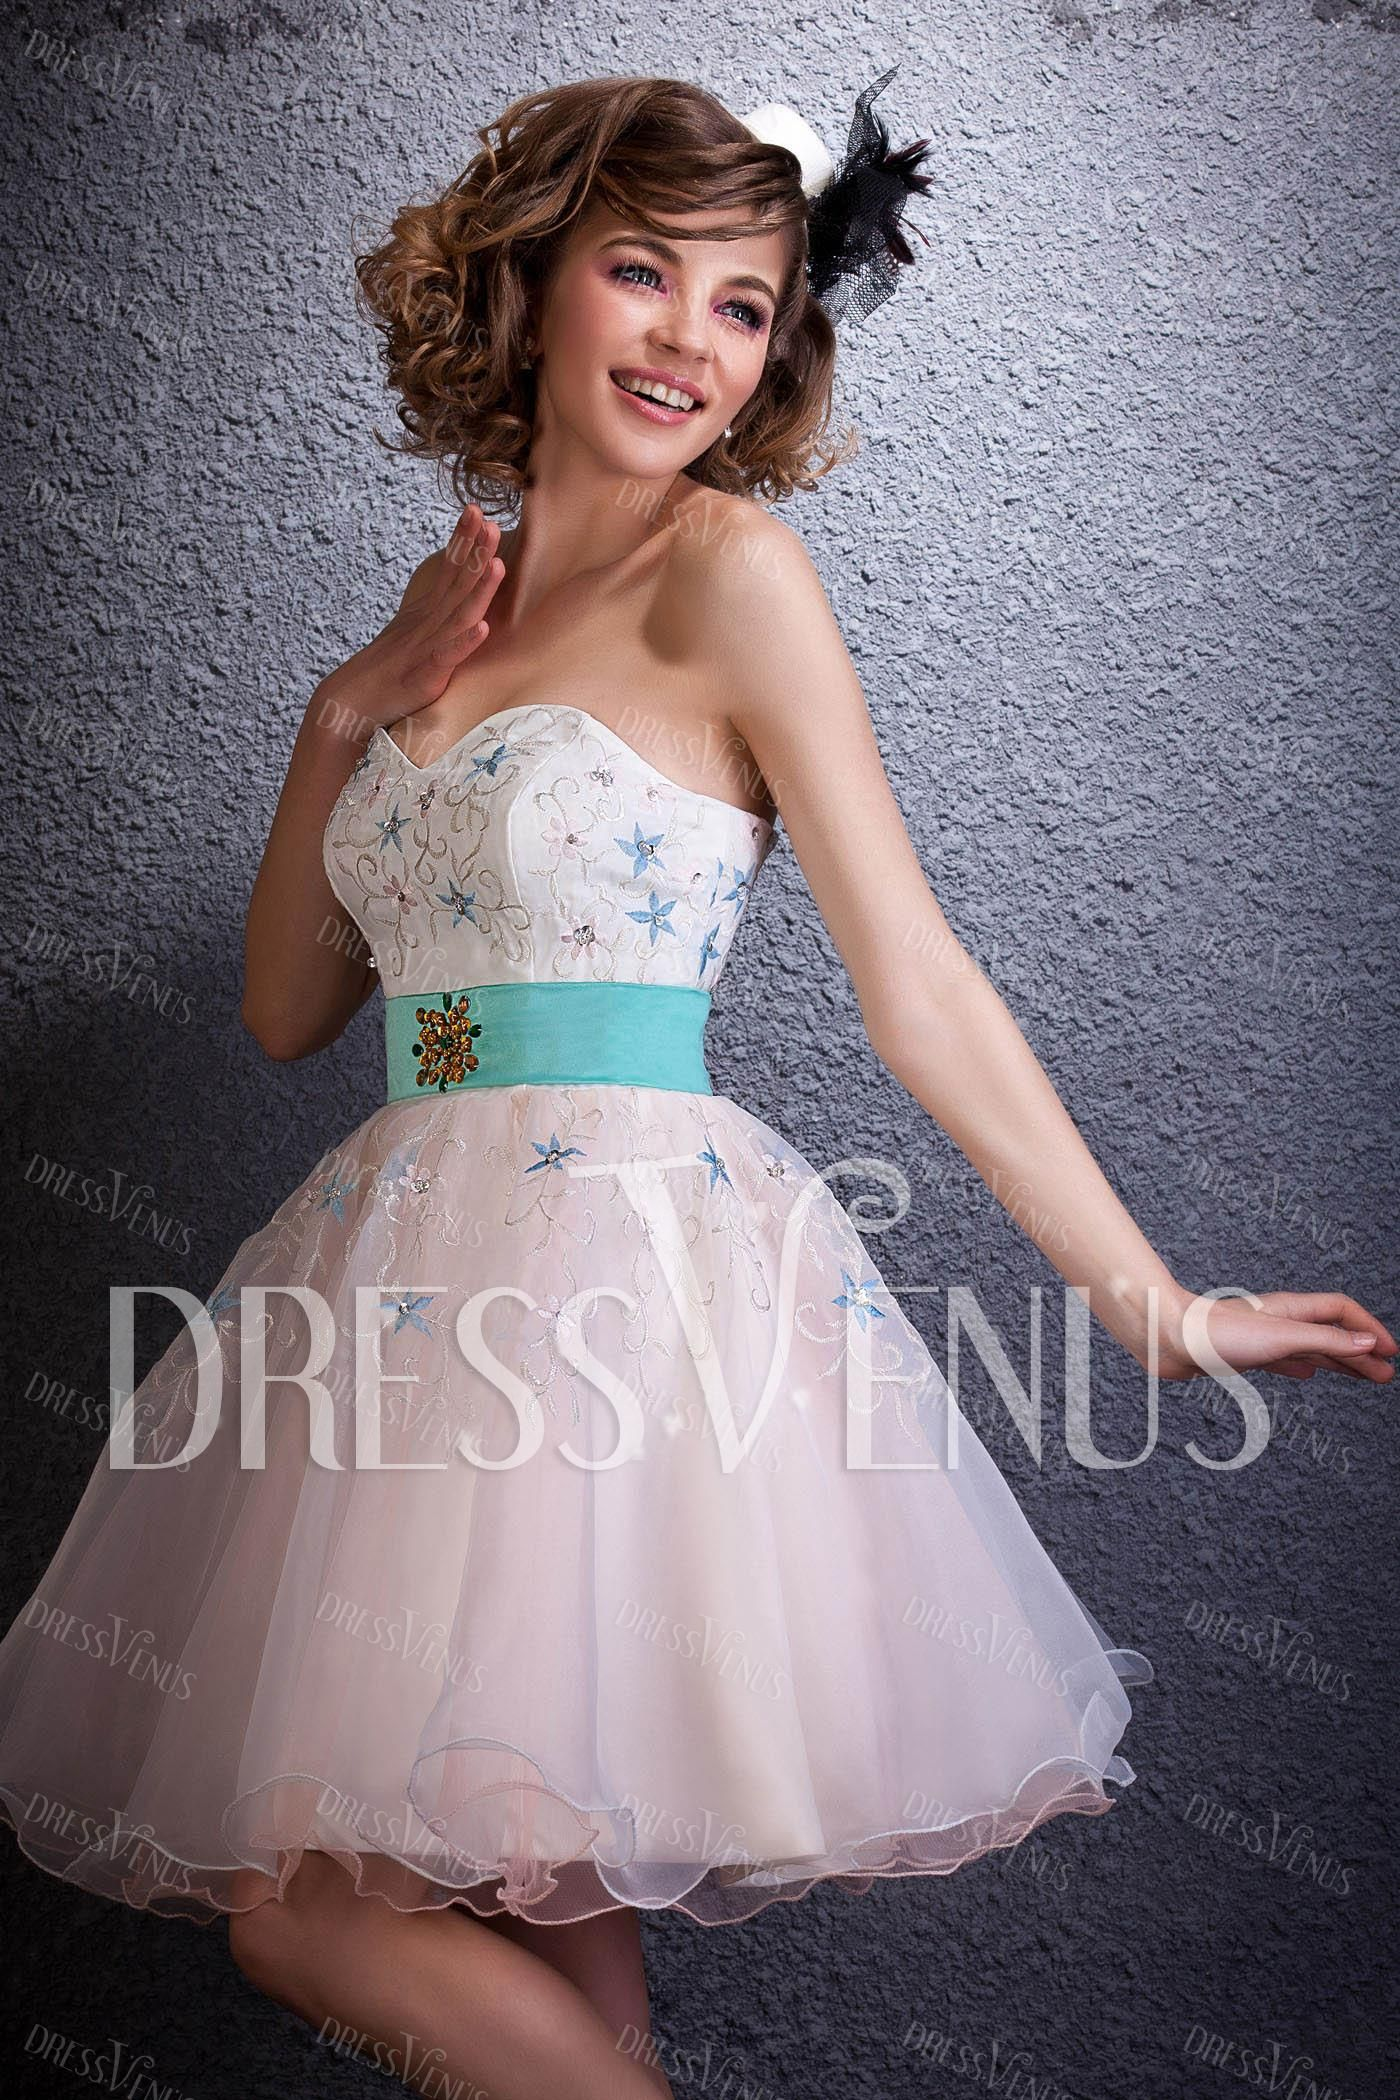 #MiniDress #A-Line Mini/Short-Length Cocktail/Prom Dress  #CocktailDress #